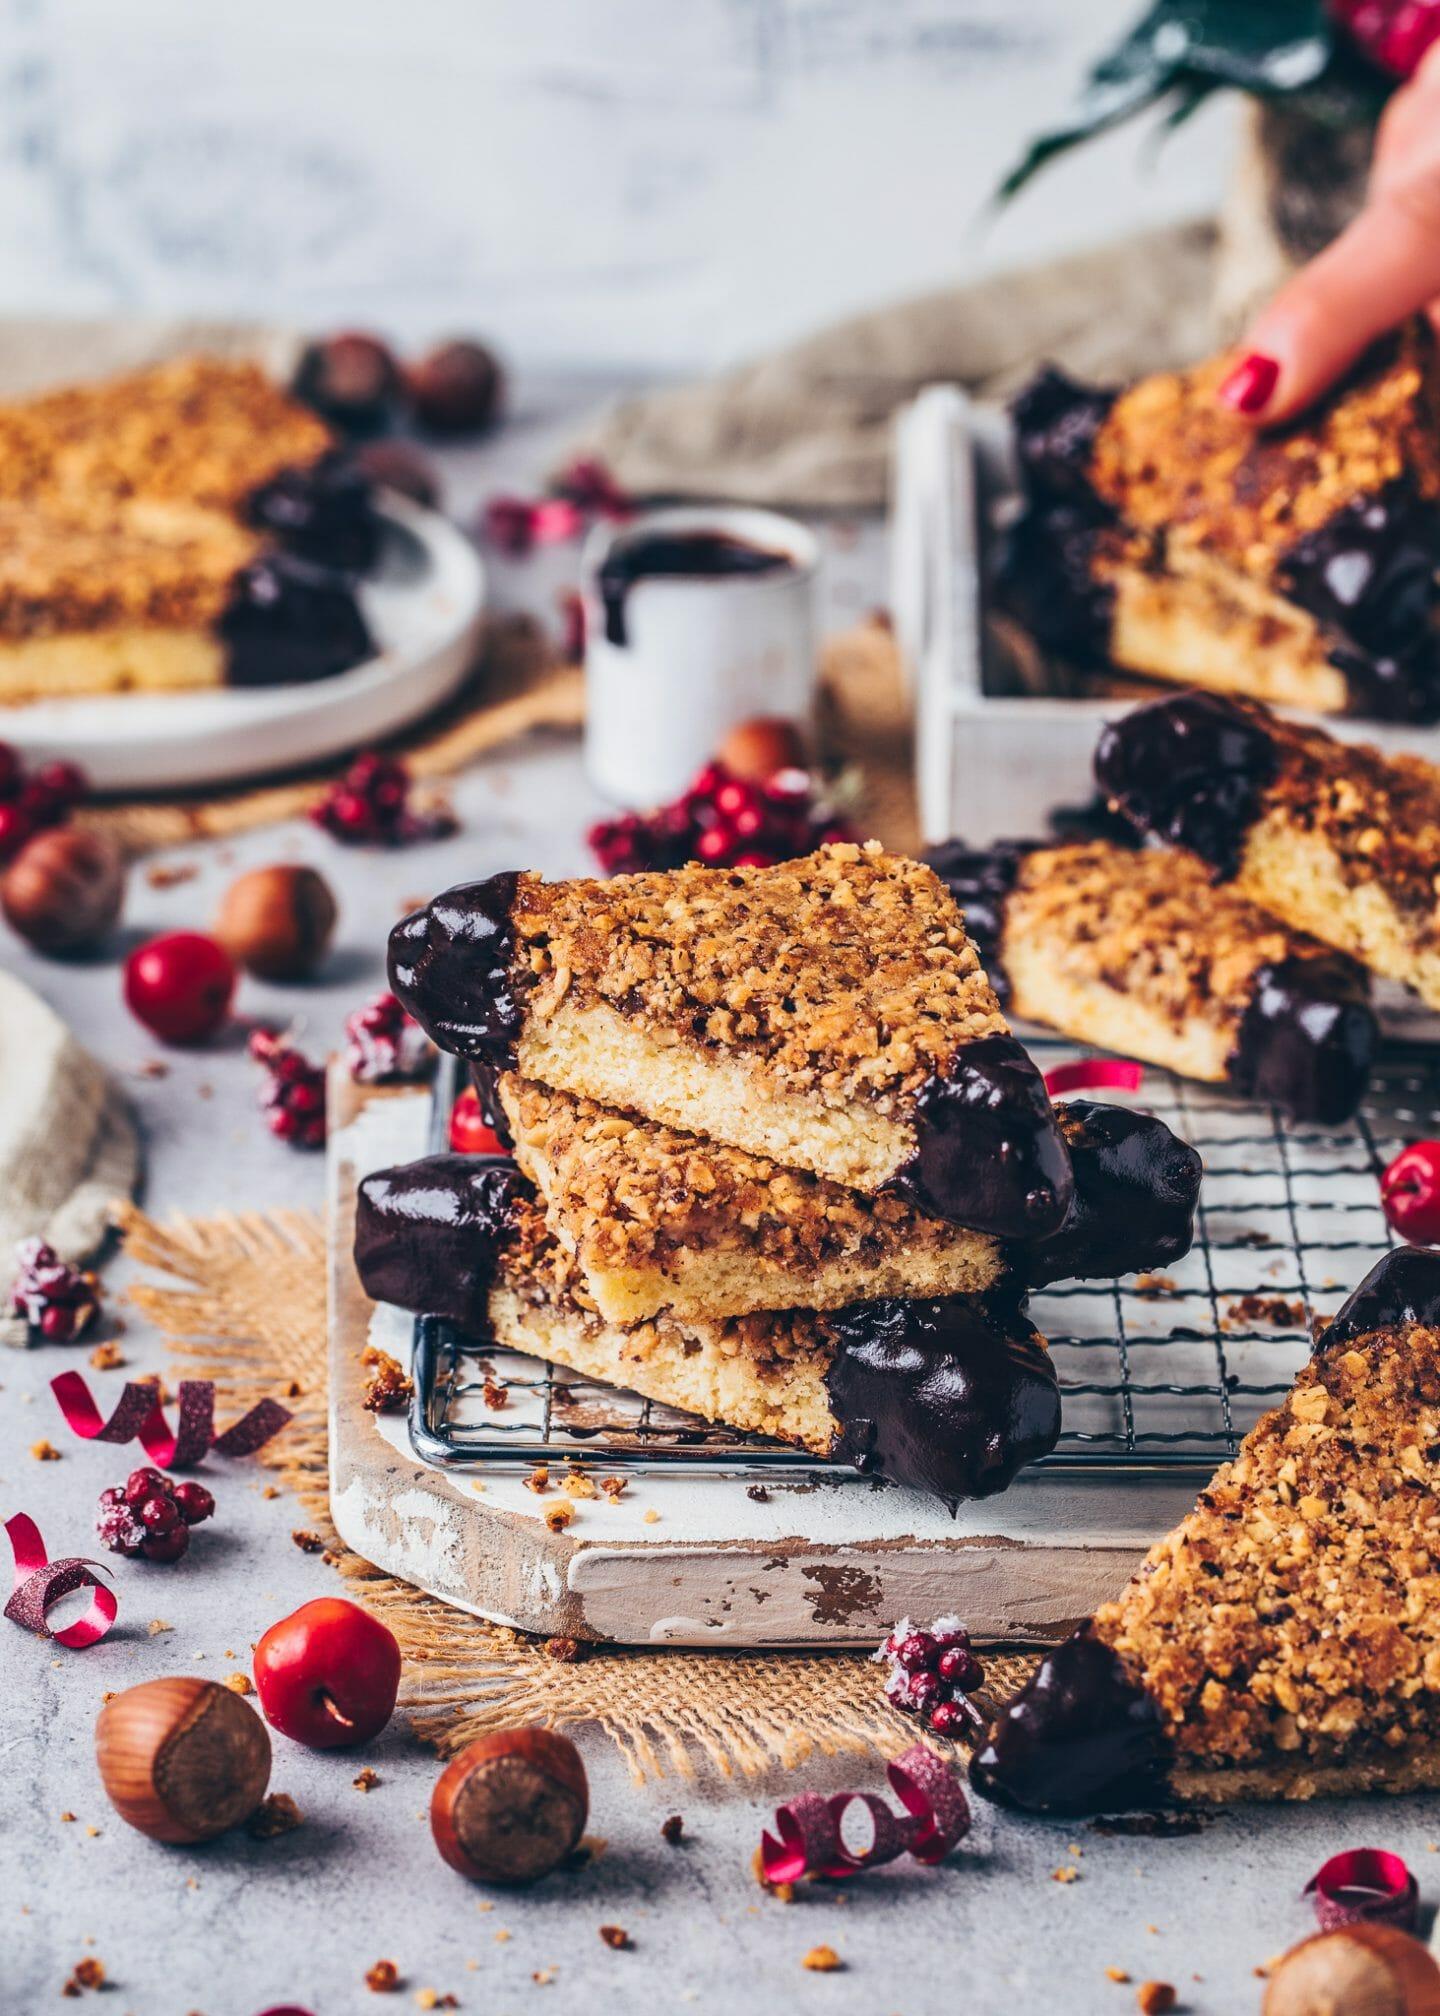 nut bars (hazelnut cookie corners with chocolate)